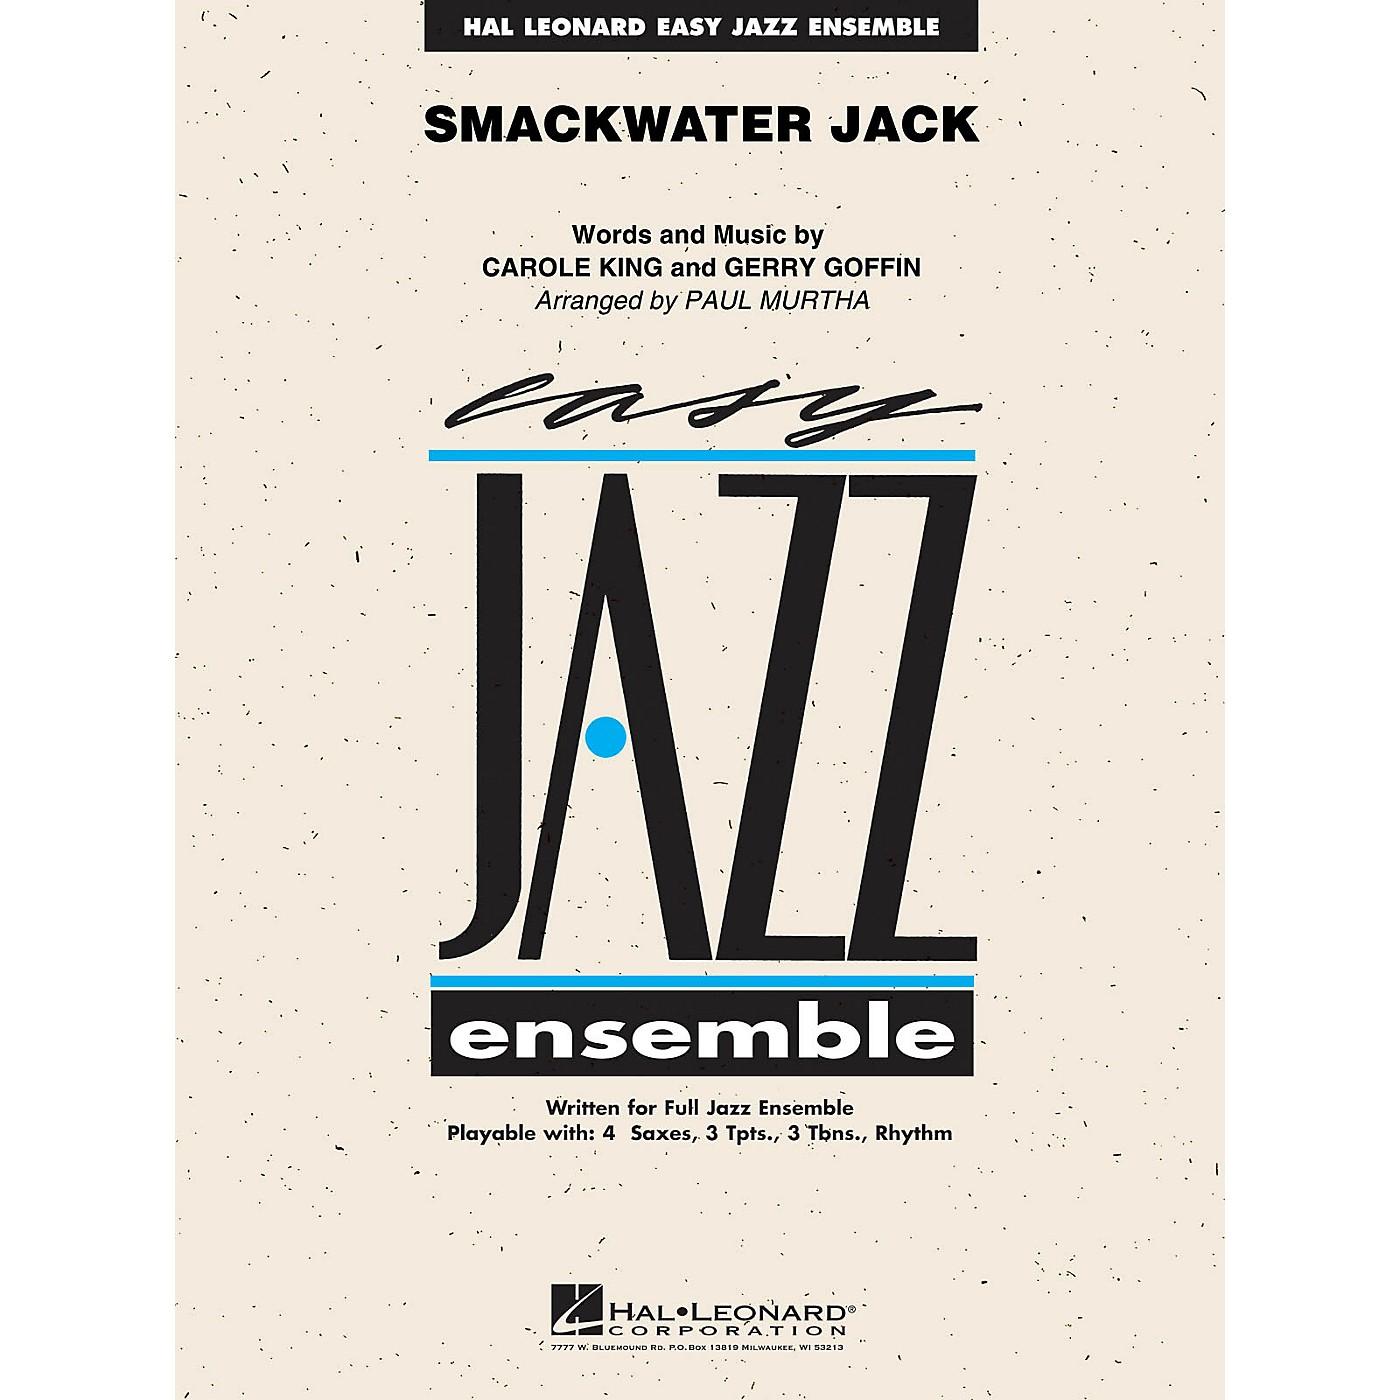 Hal Leonard Smackwater Jack Jazz Band Level 2 Arranged by Paul Murtha thumbnail